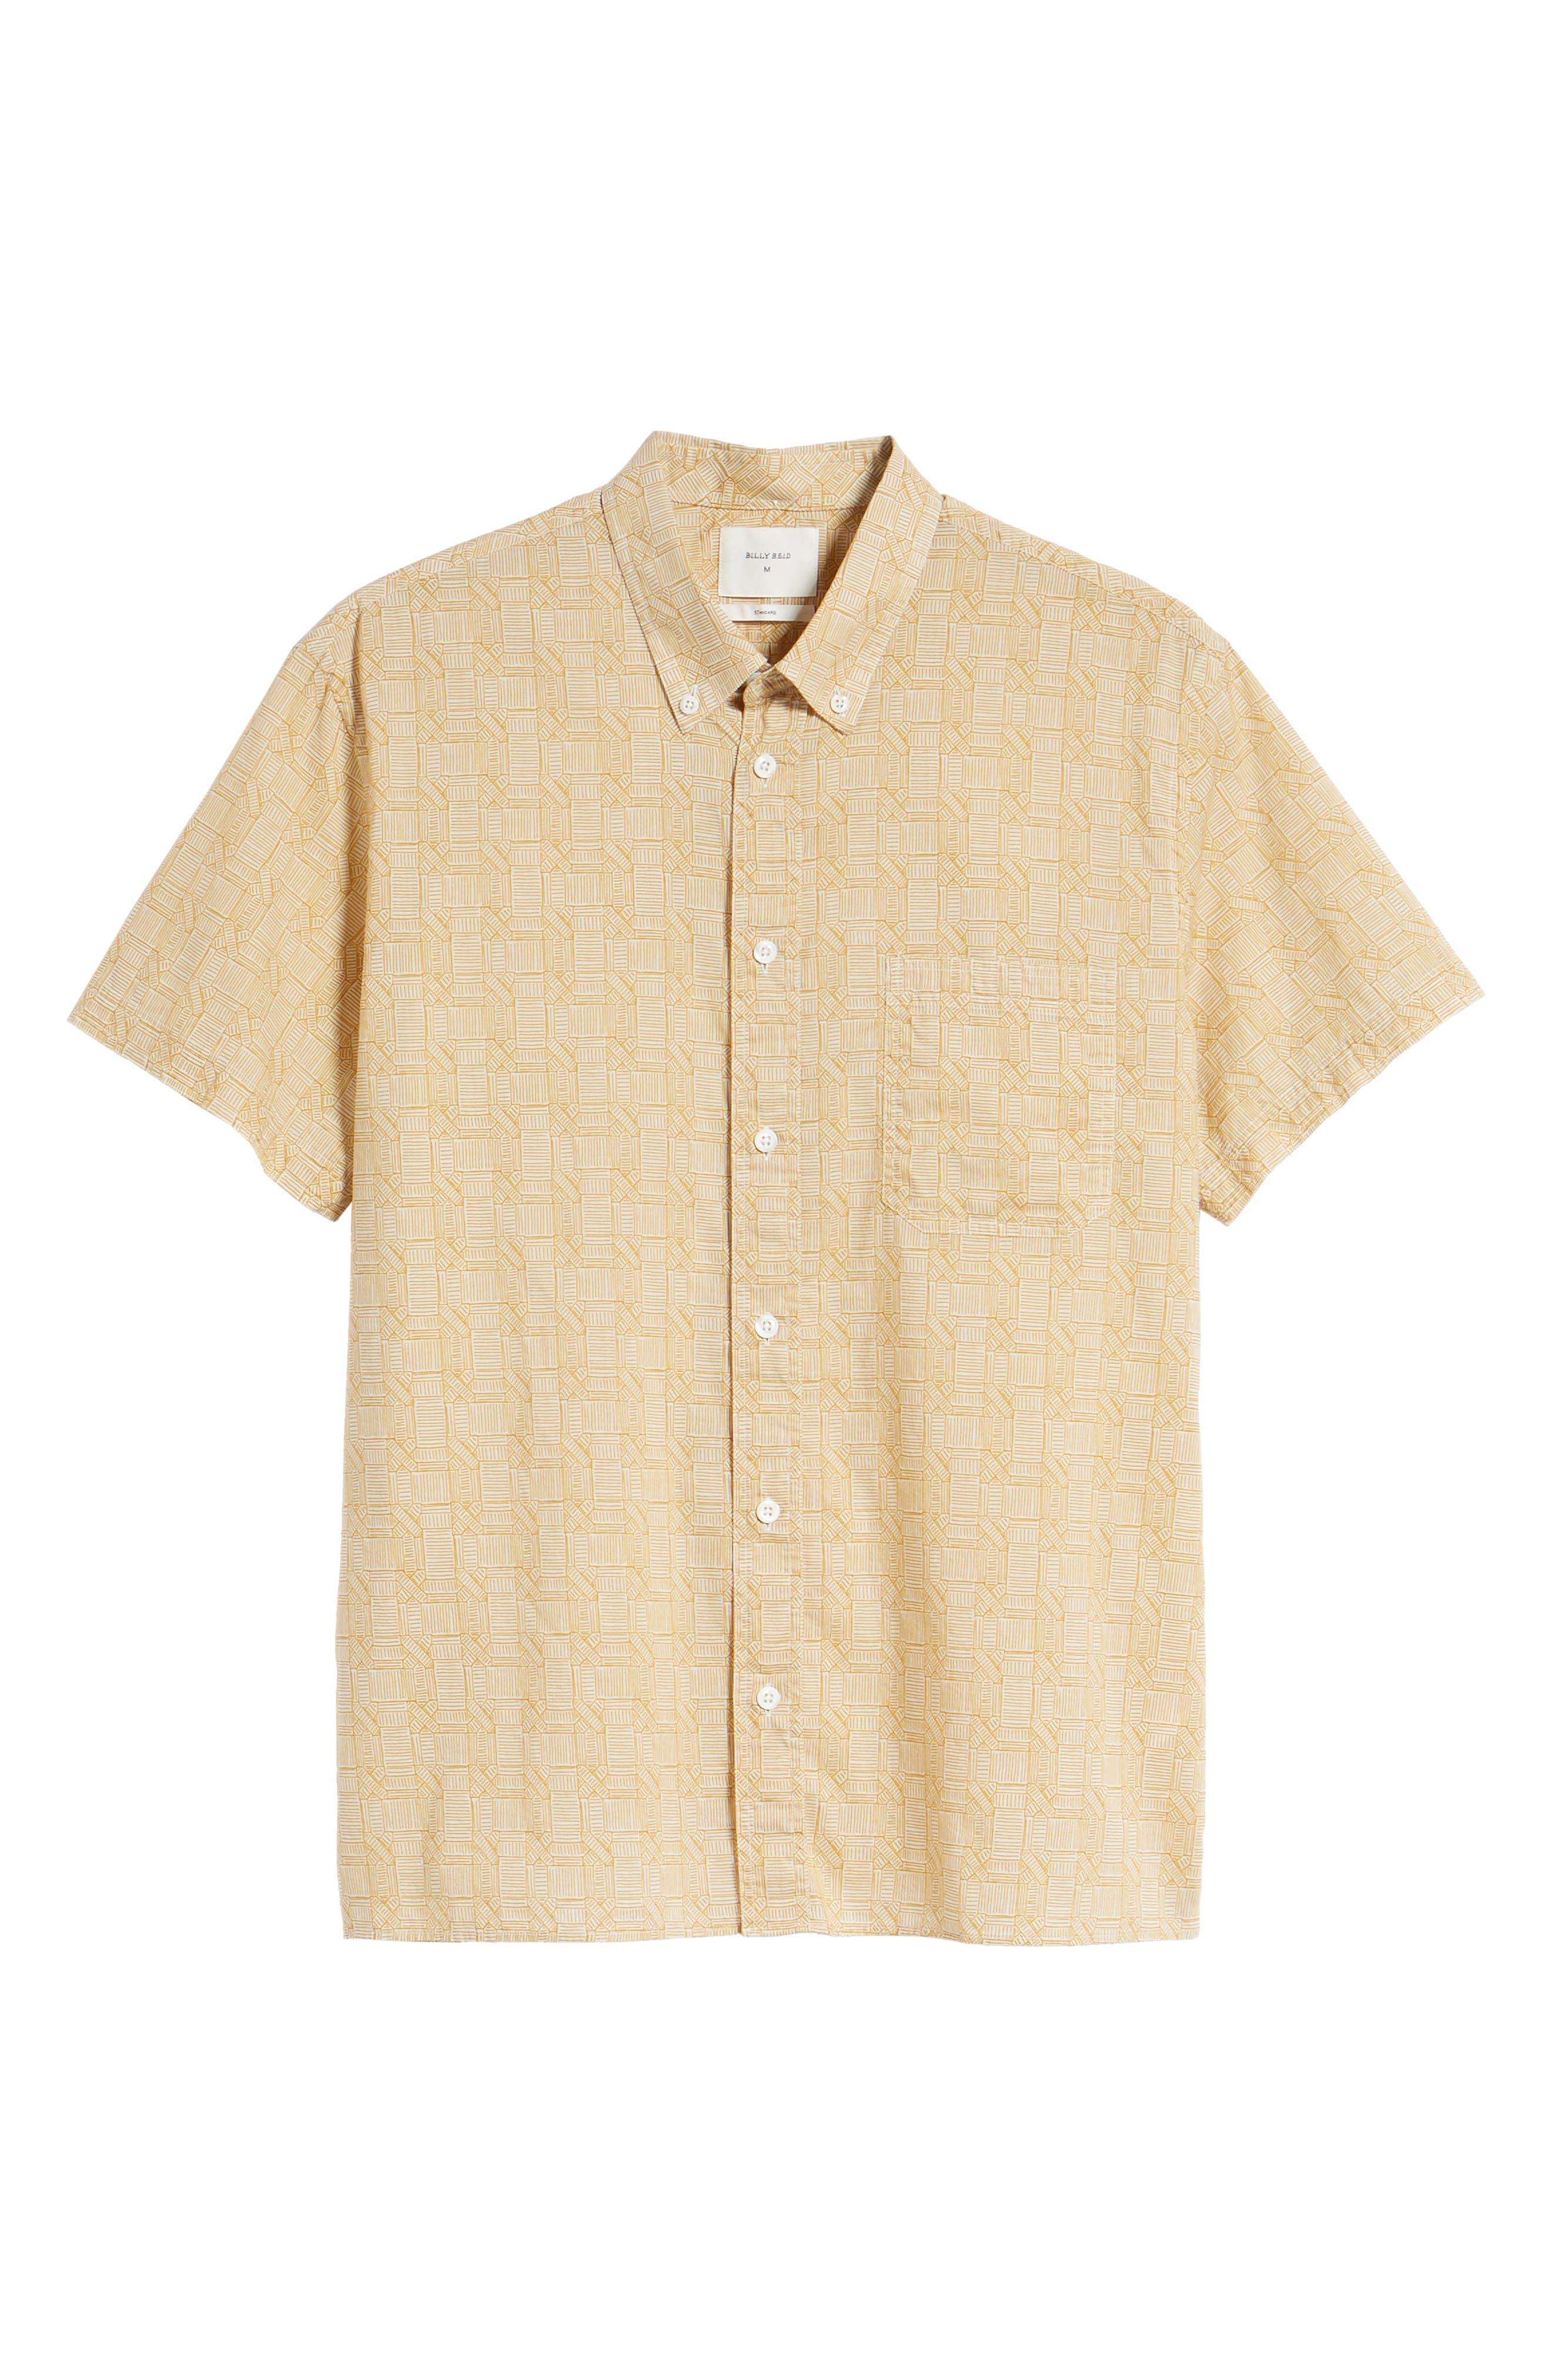 Leo Standard Fit Short Sleeve Sport Shirt,                             Alternate thumbnail 6, color,                             Mustard Docks